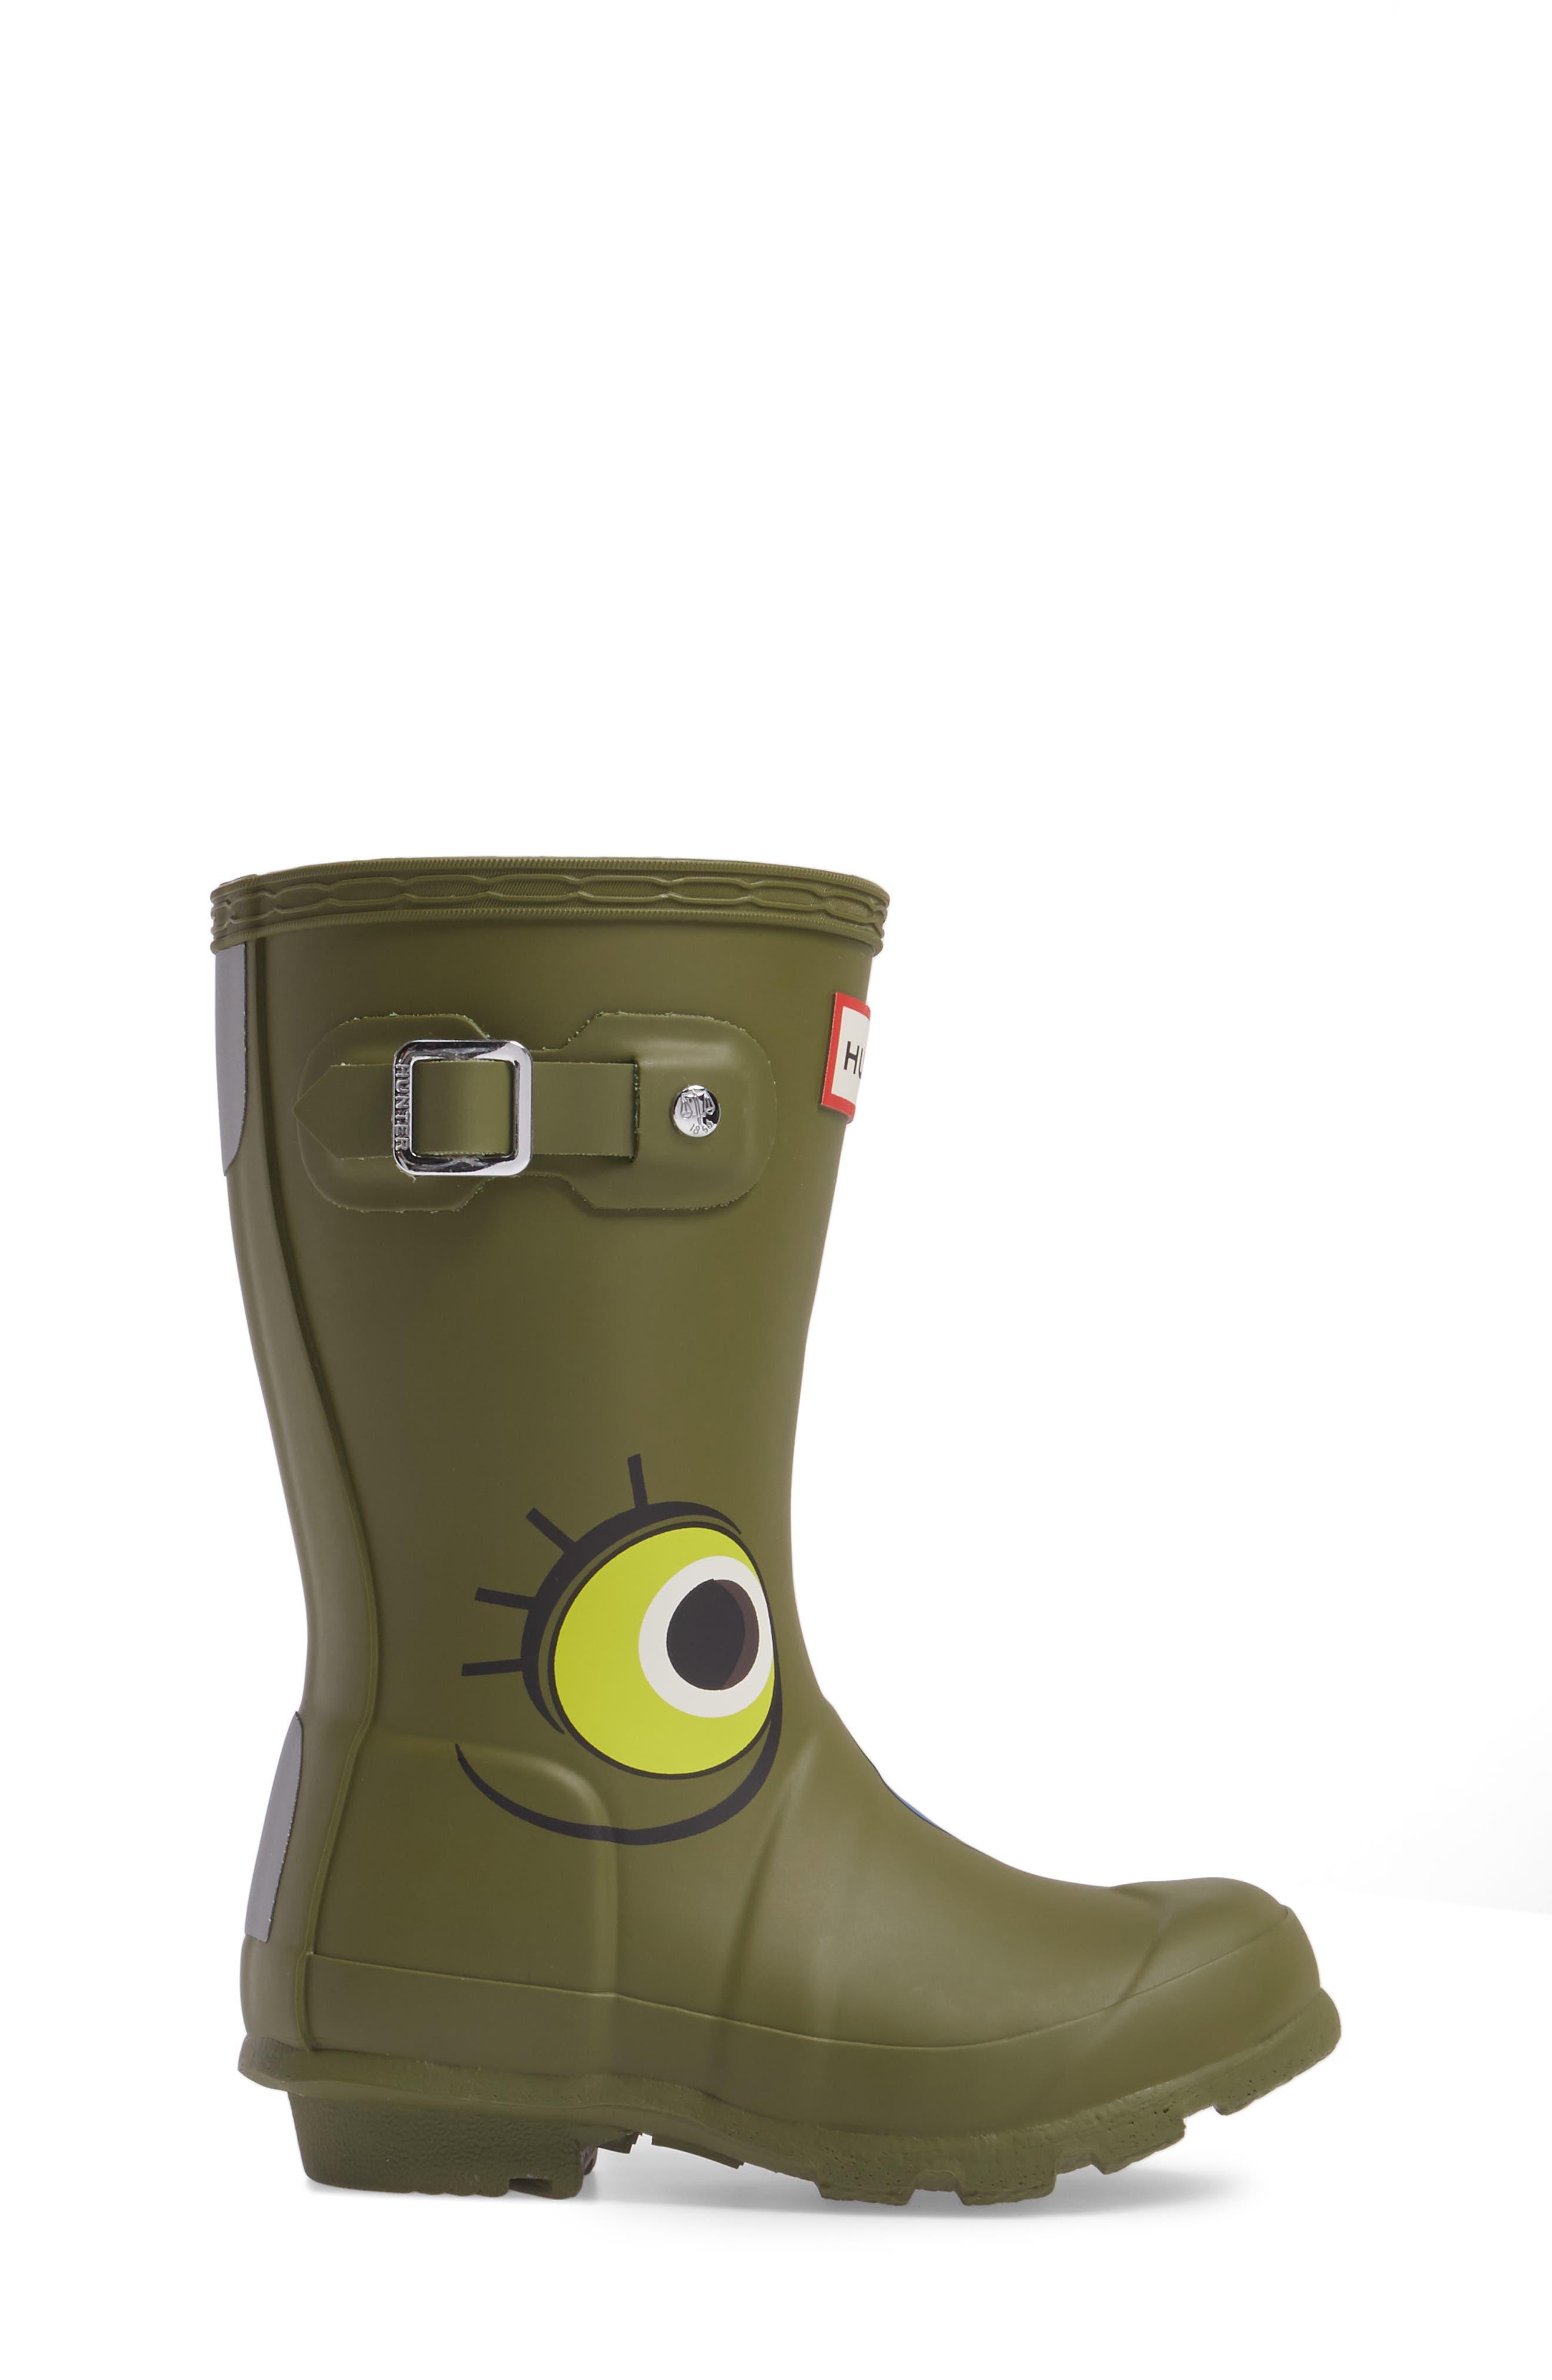 Alien Waterproof Rain Boot,                             Alternate thumbnail 3, color,                             309